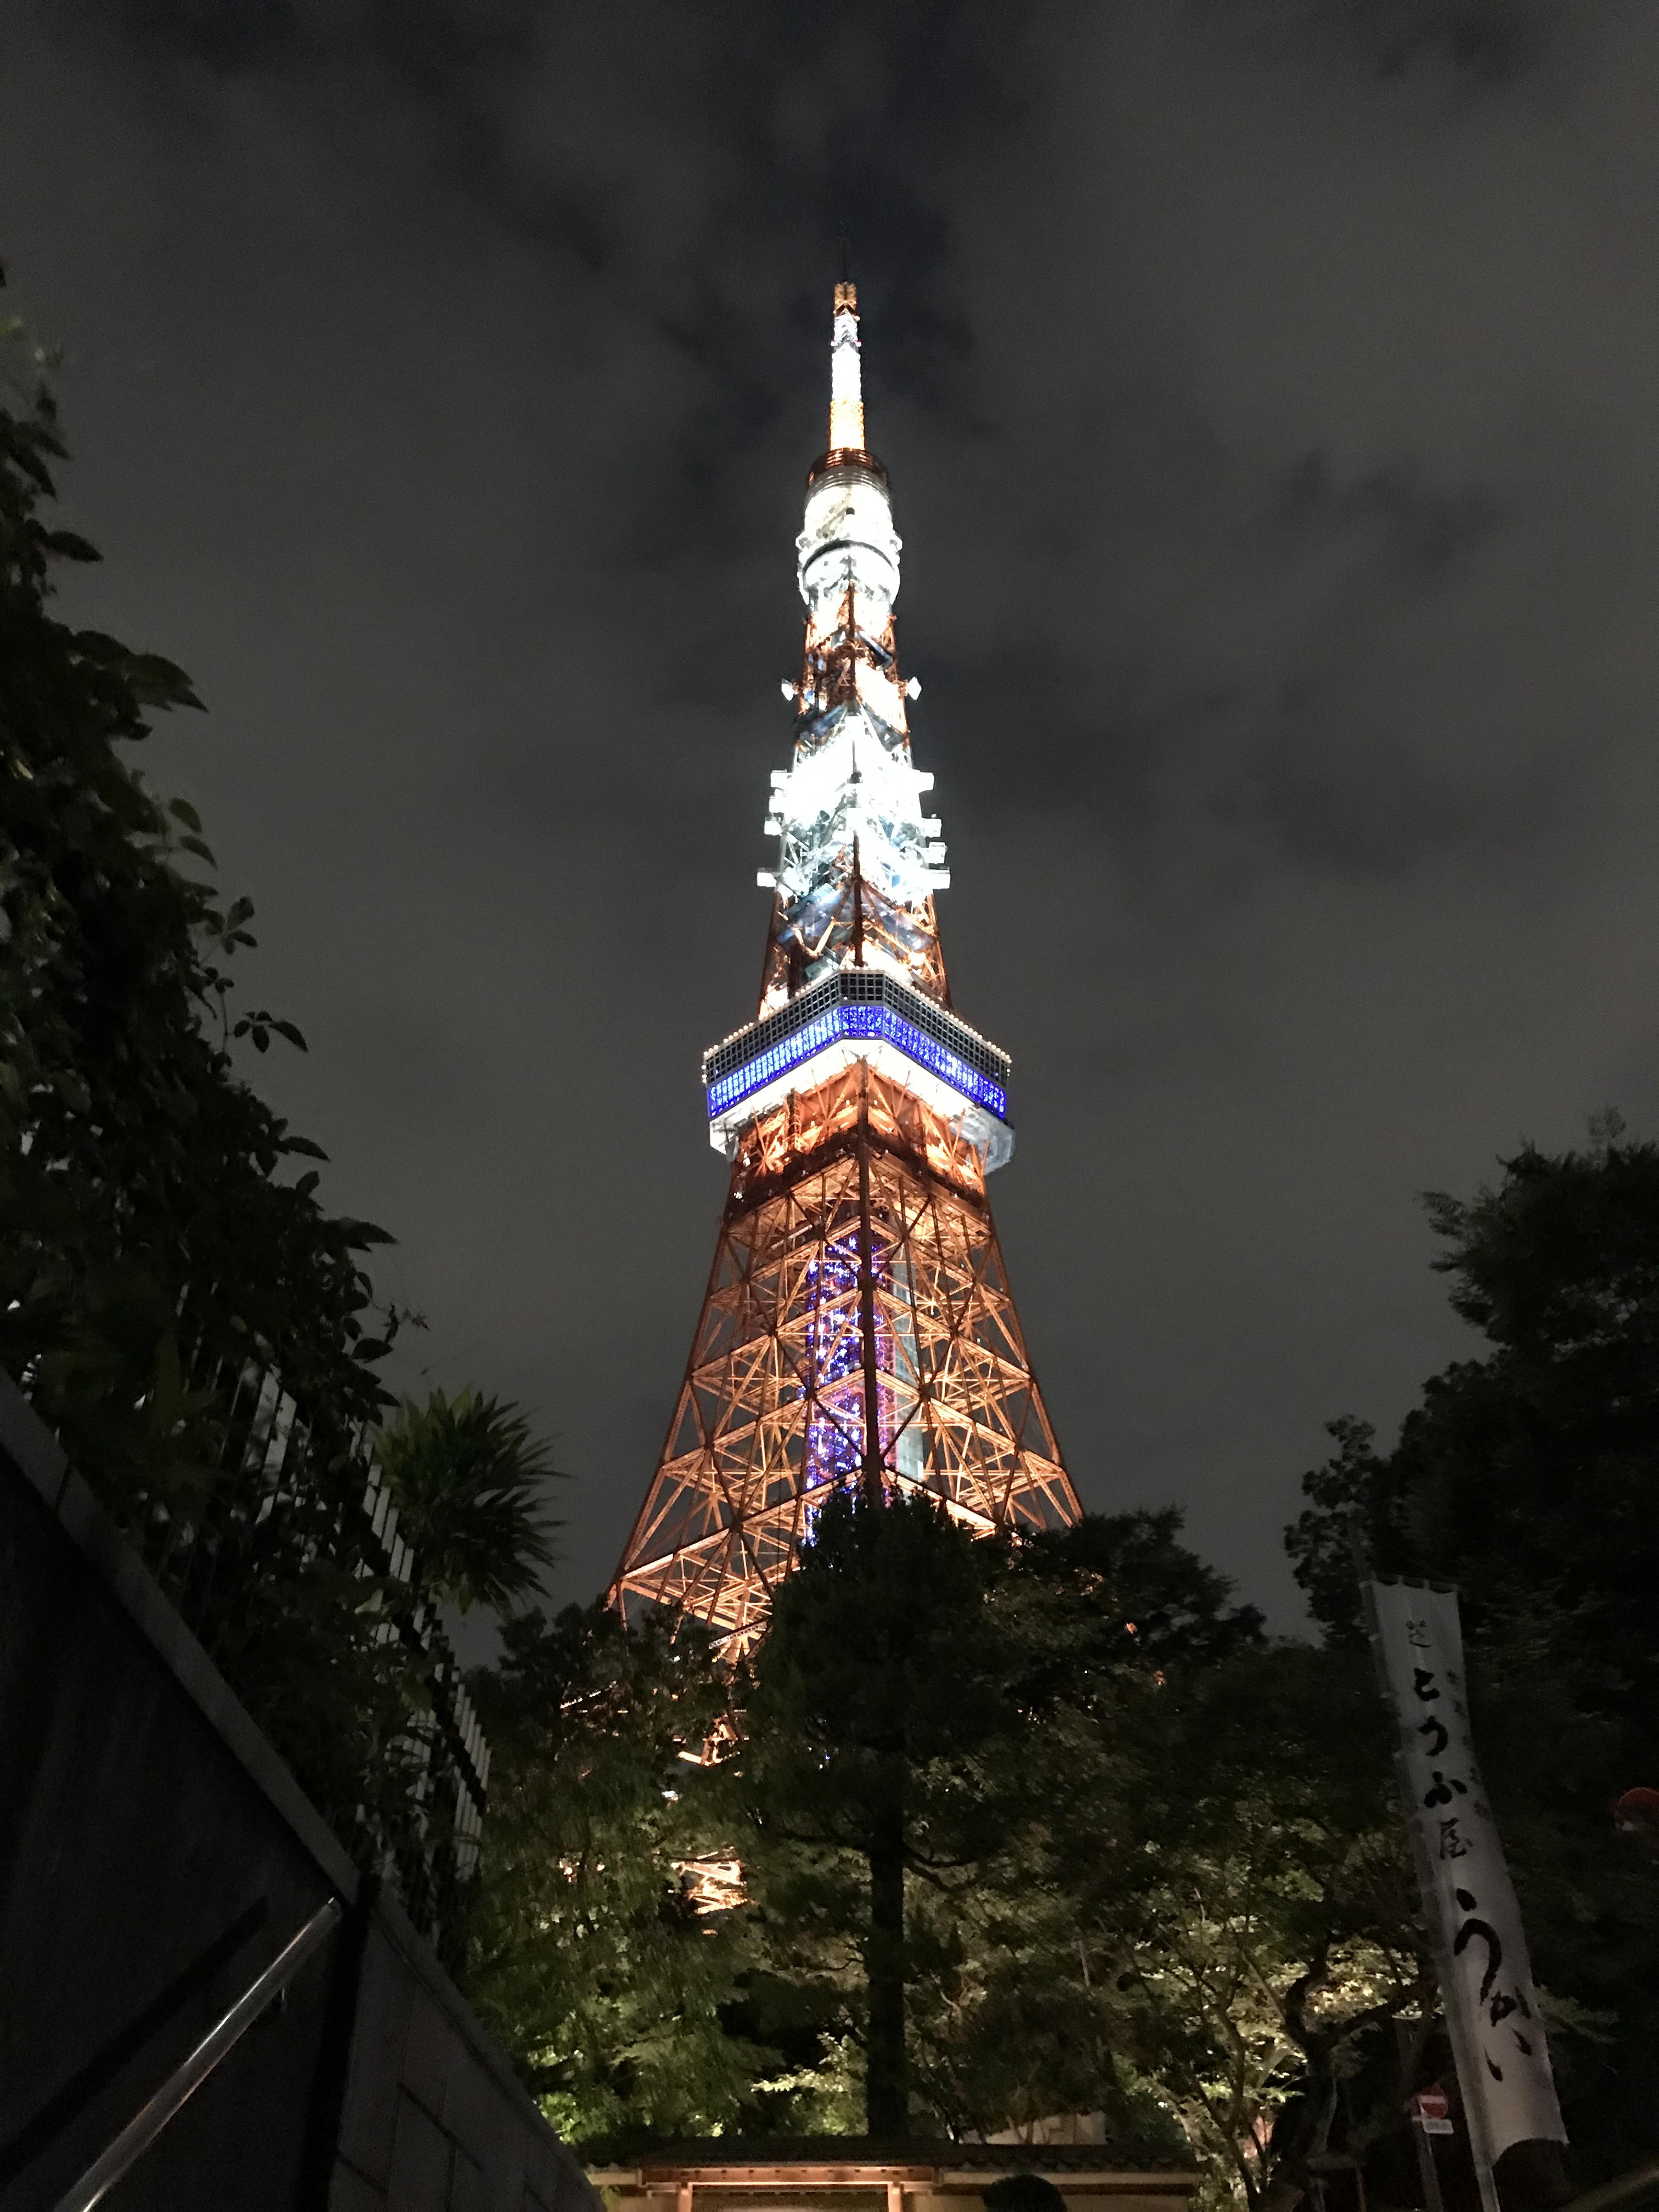 TOKYO TOWER HALLOWEEN NIGHT FANTASIA / TOKYO TOWER CITY LIGHT FANTASIA NAKEDのプロジェクションマッピングとハロウィンが同時に楽しめる、期間、料金は?@東京タワー